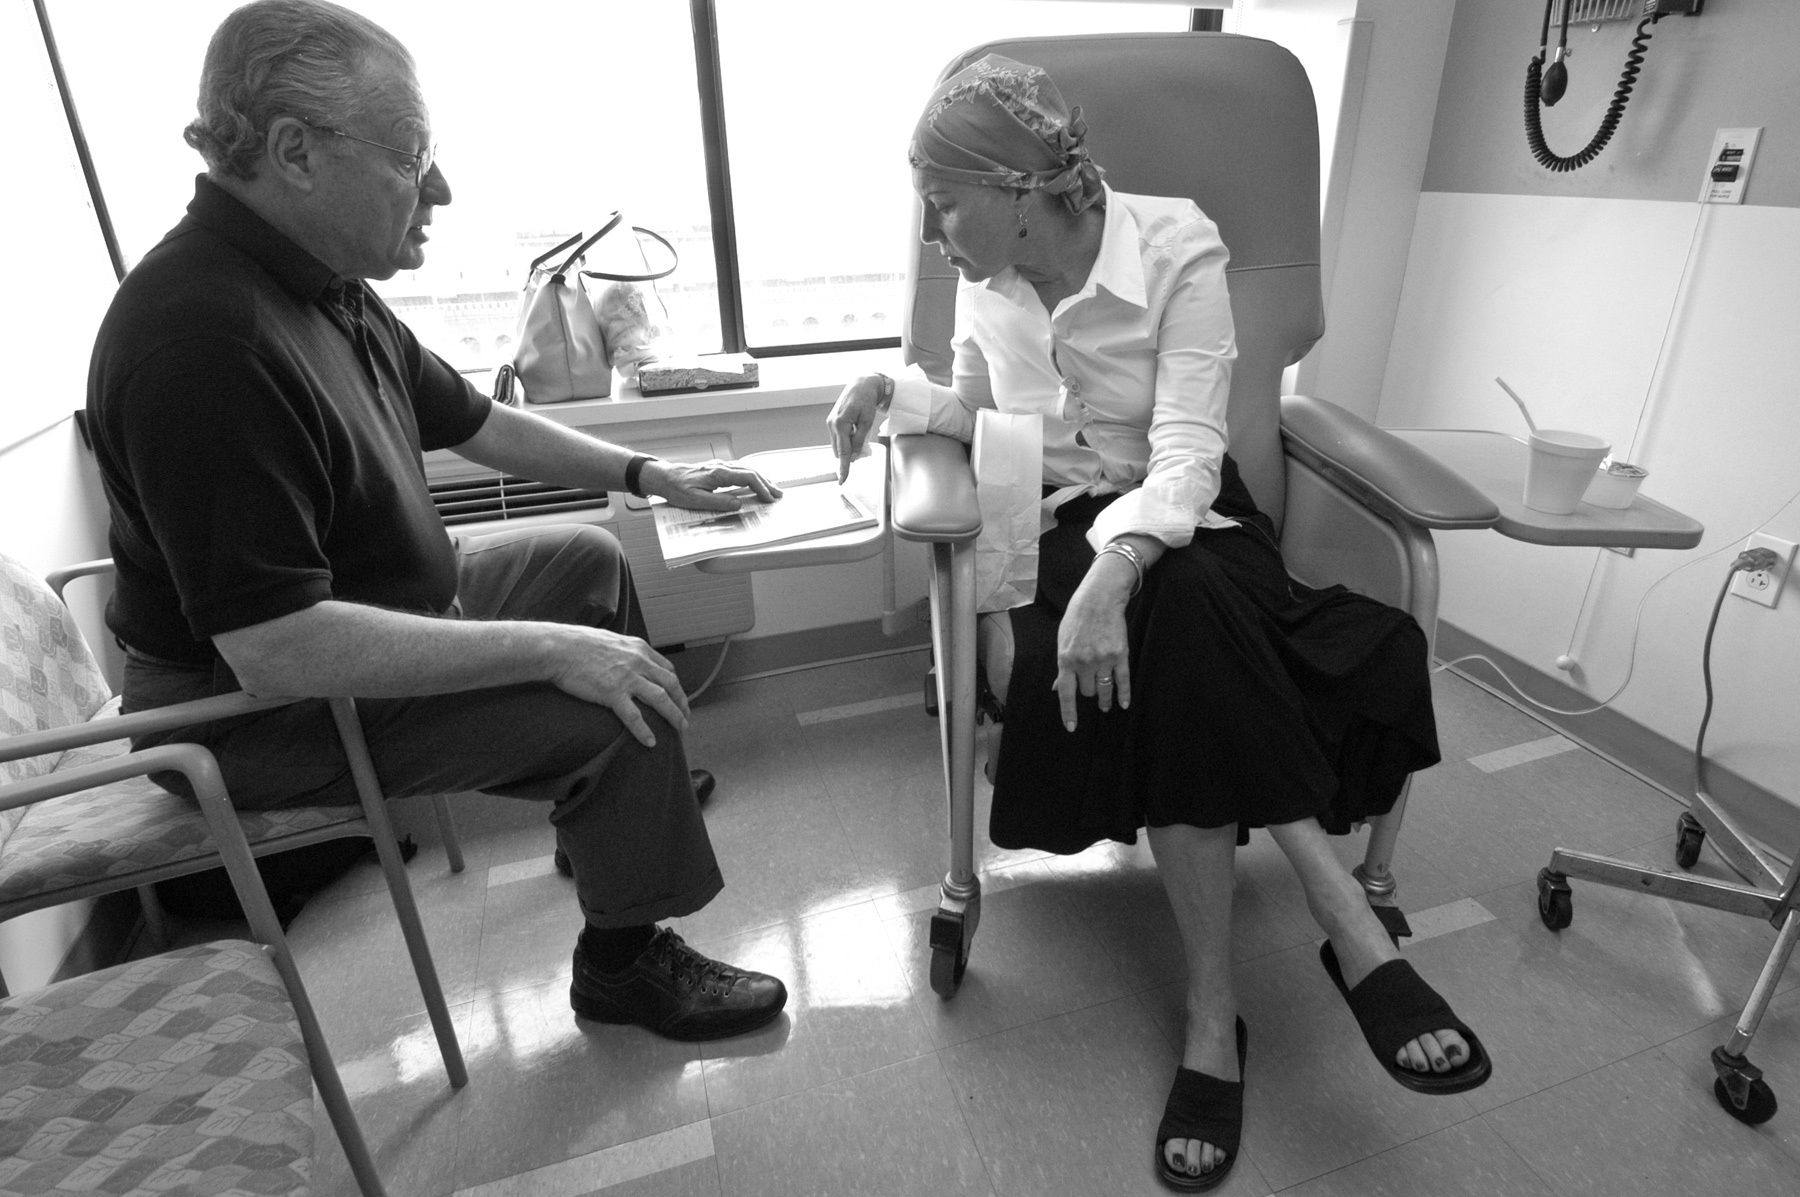 University of Pennsylvania Hospital - New York Times, 2009